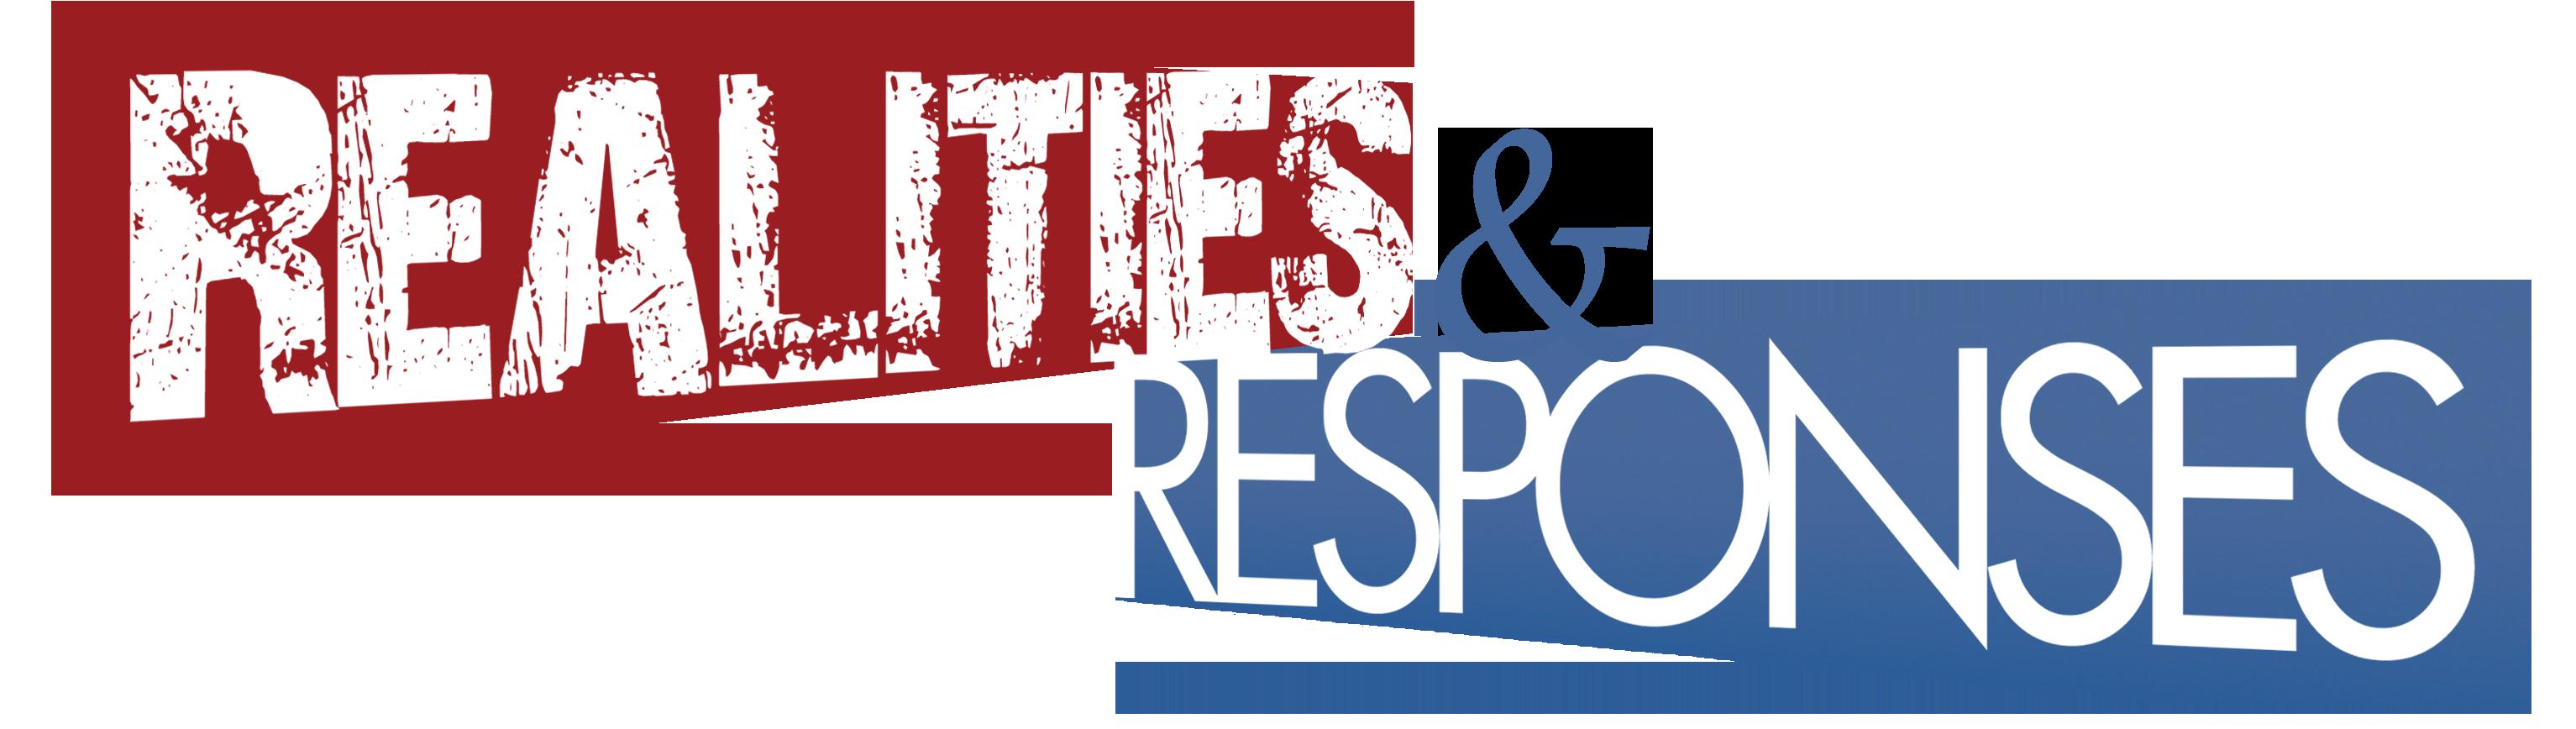 RR_text-logo_v4_skewed_wide-banners